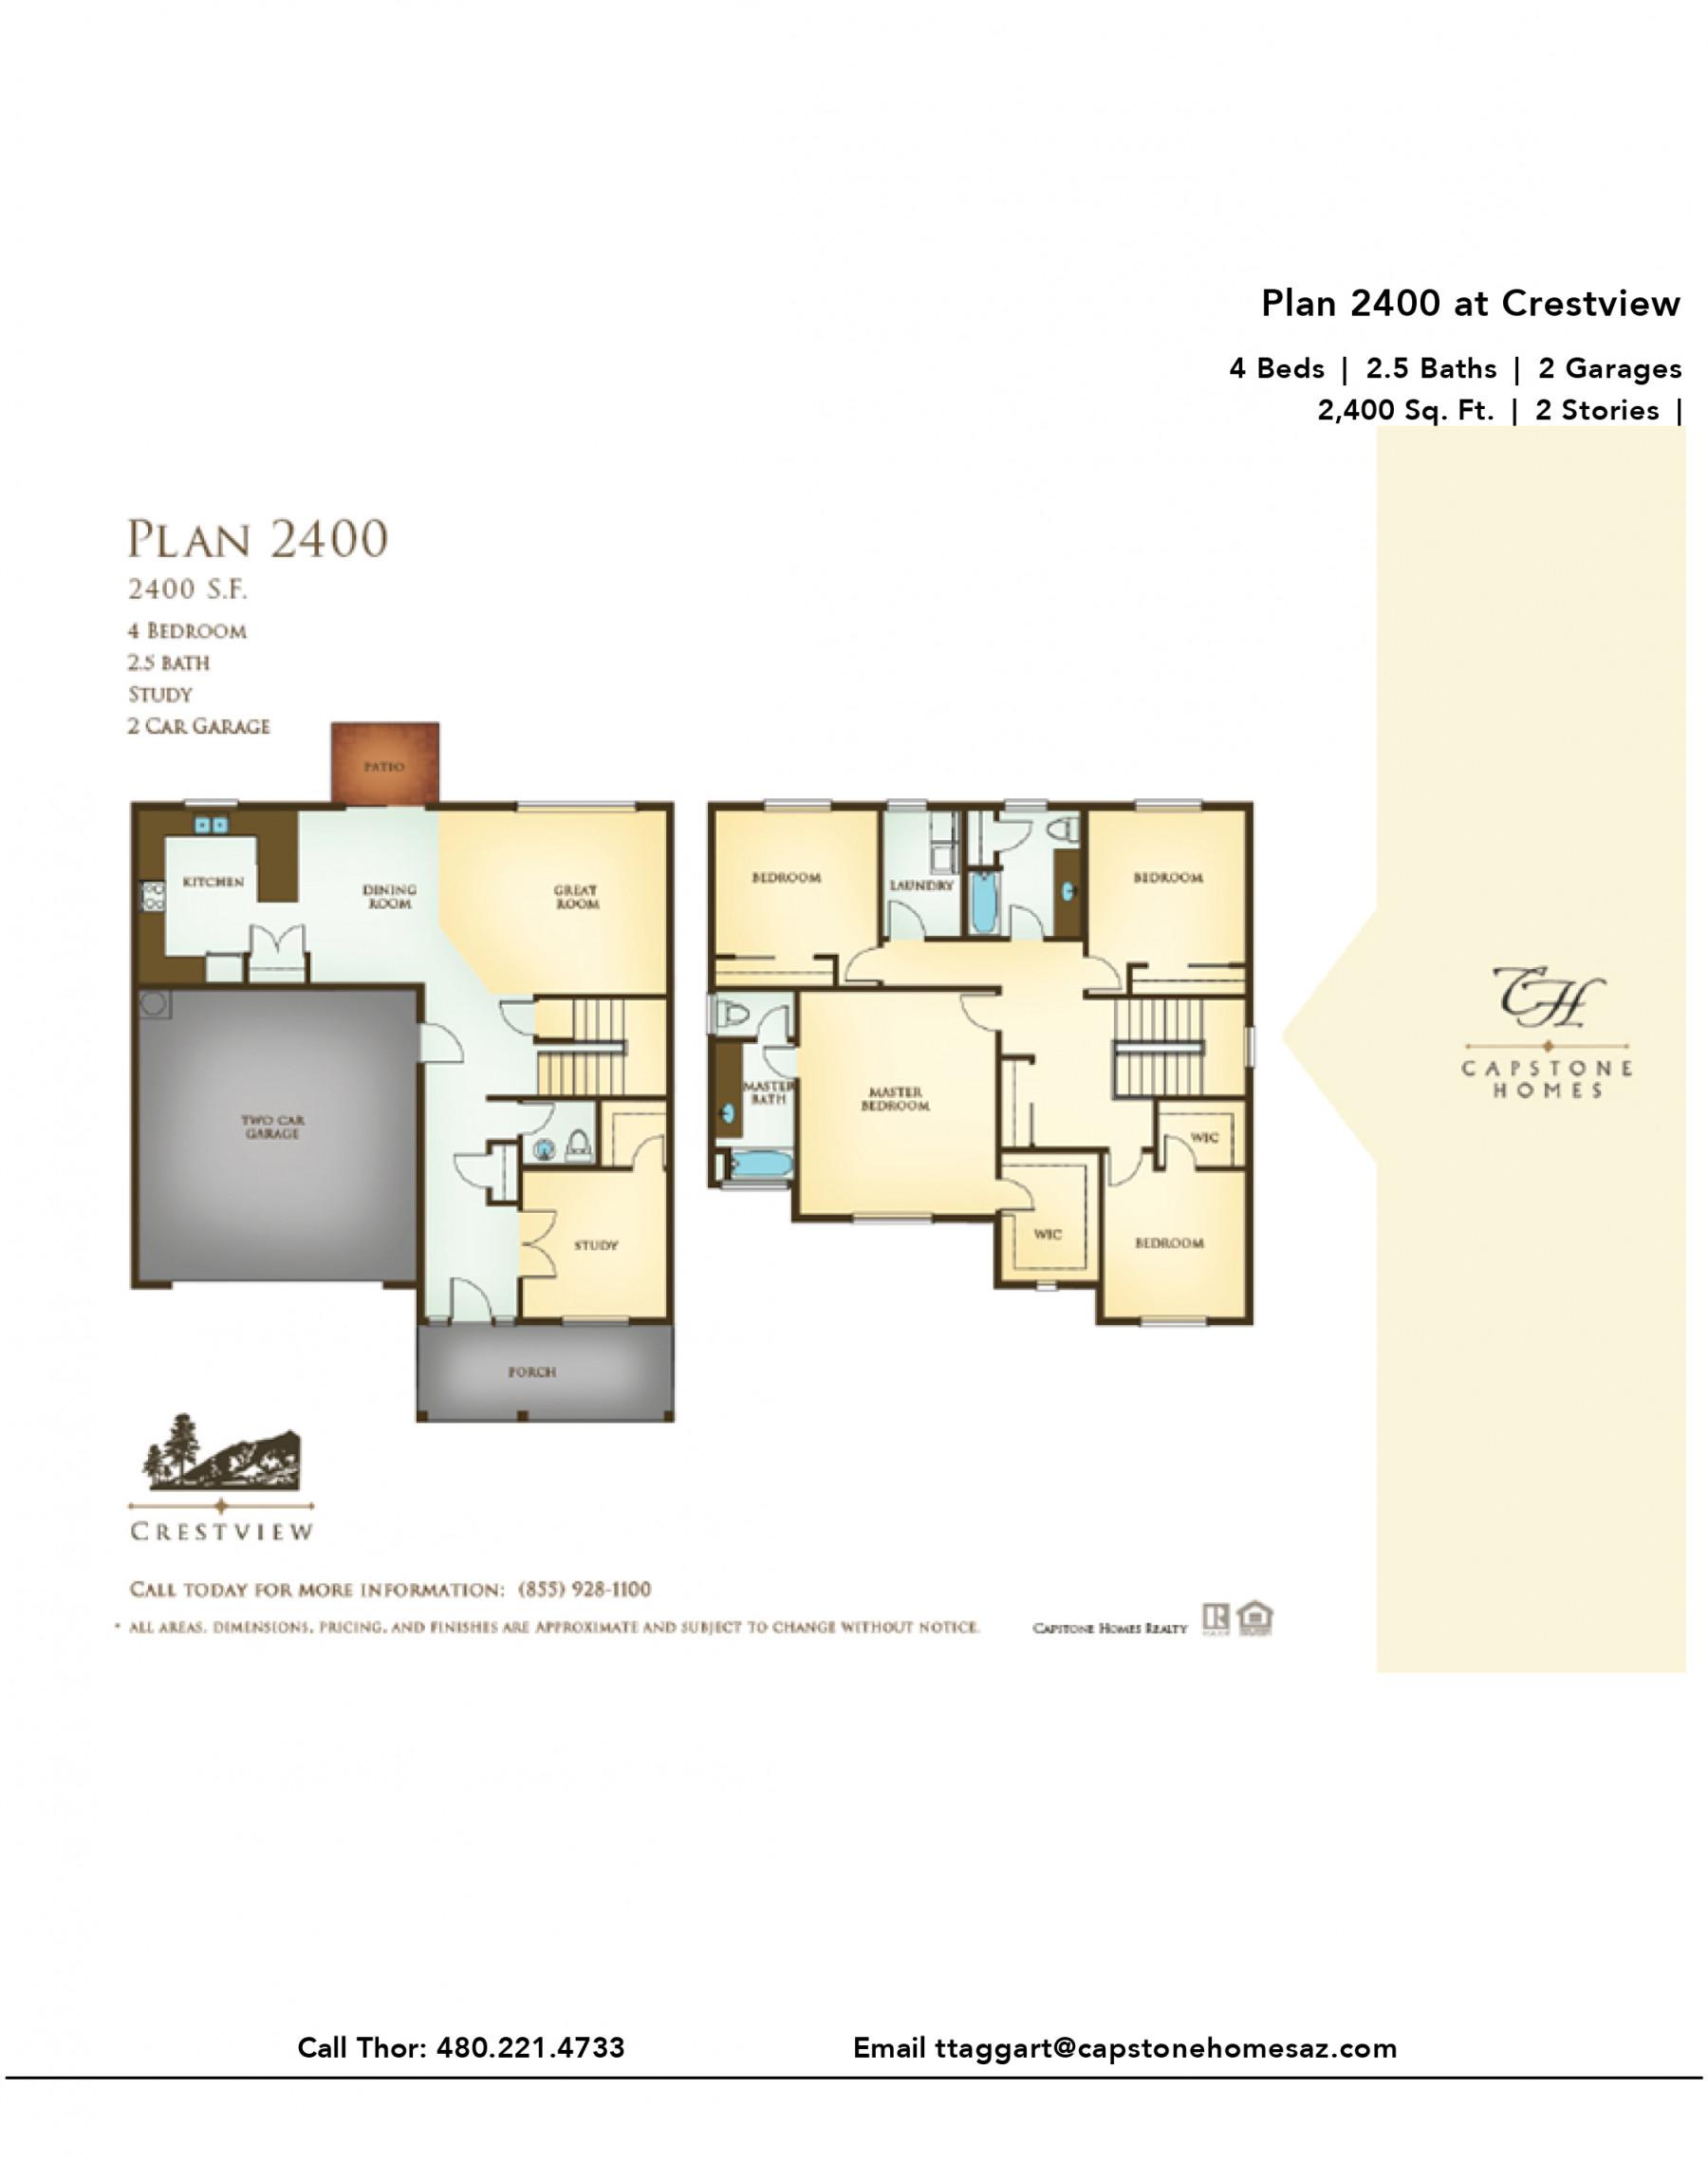 Crestview Plan 2400